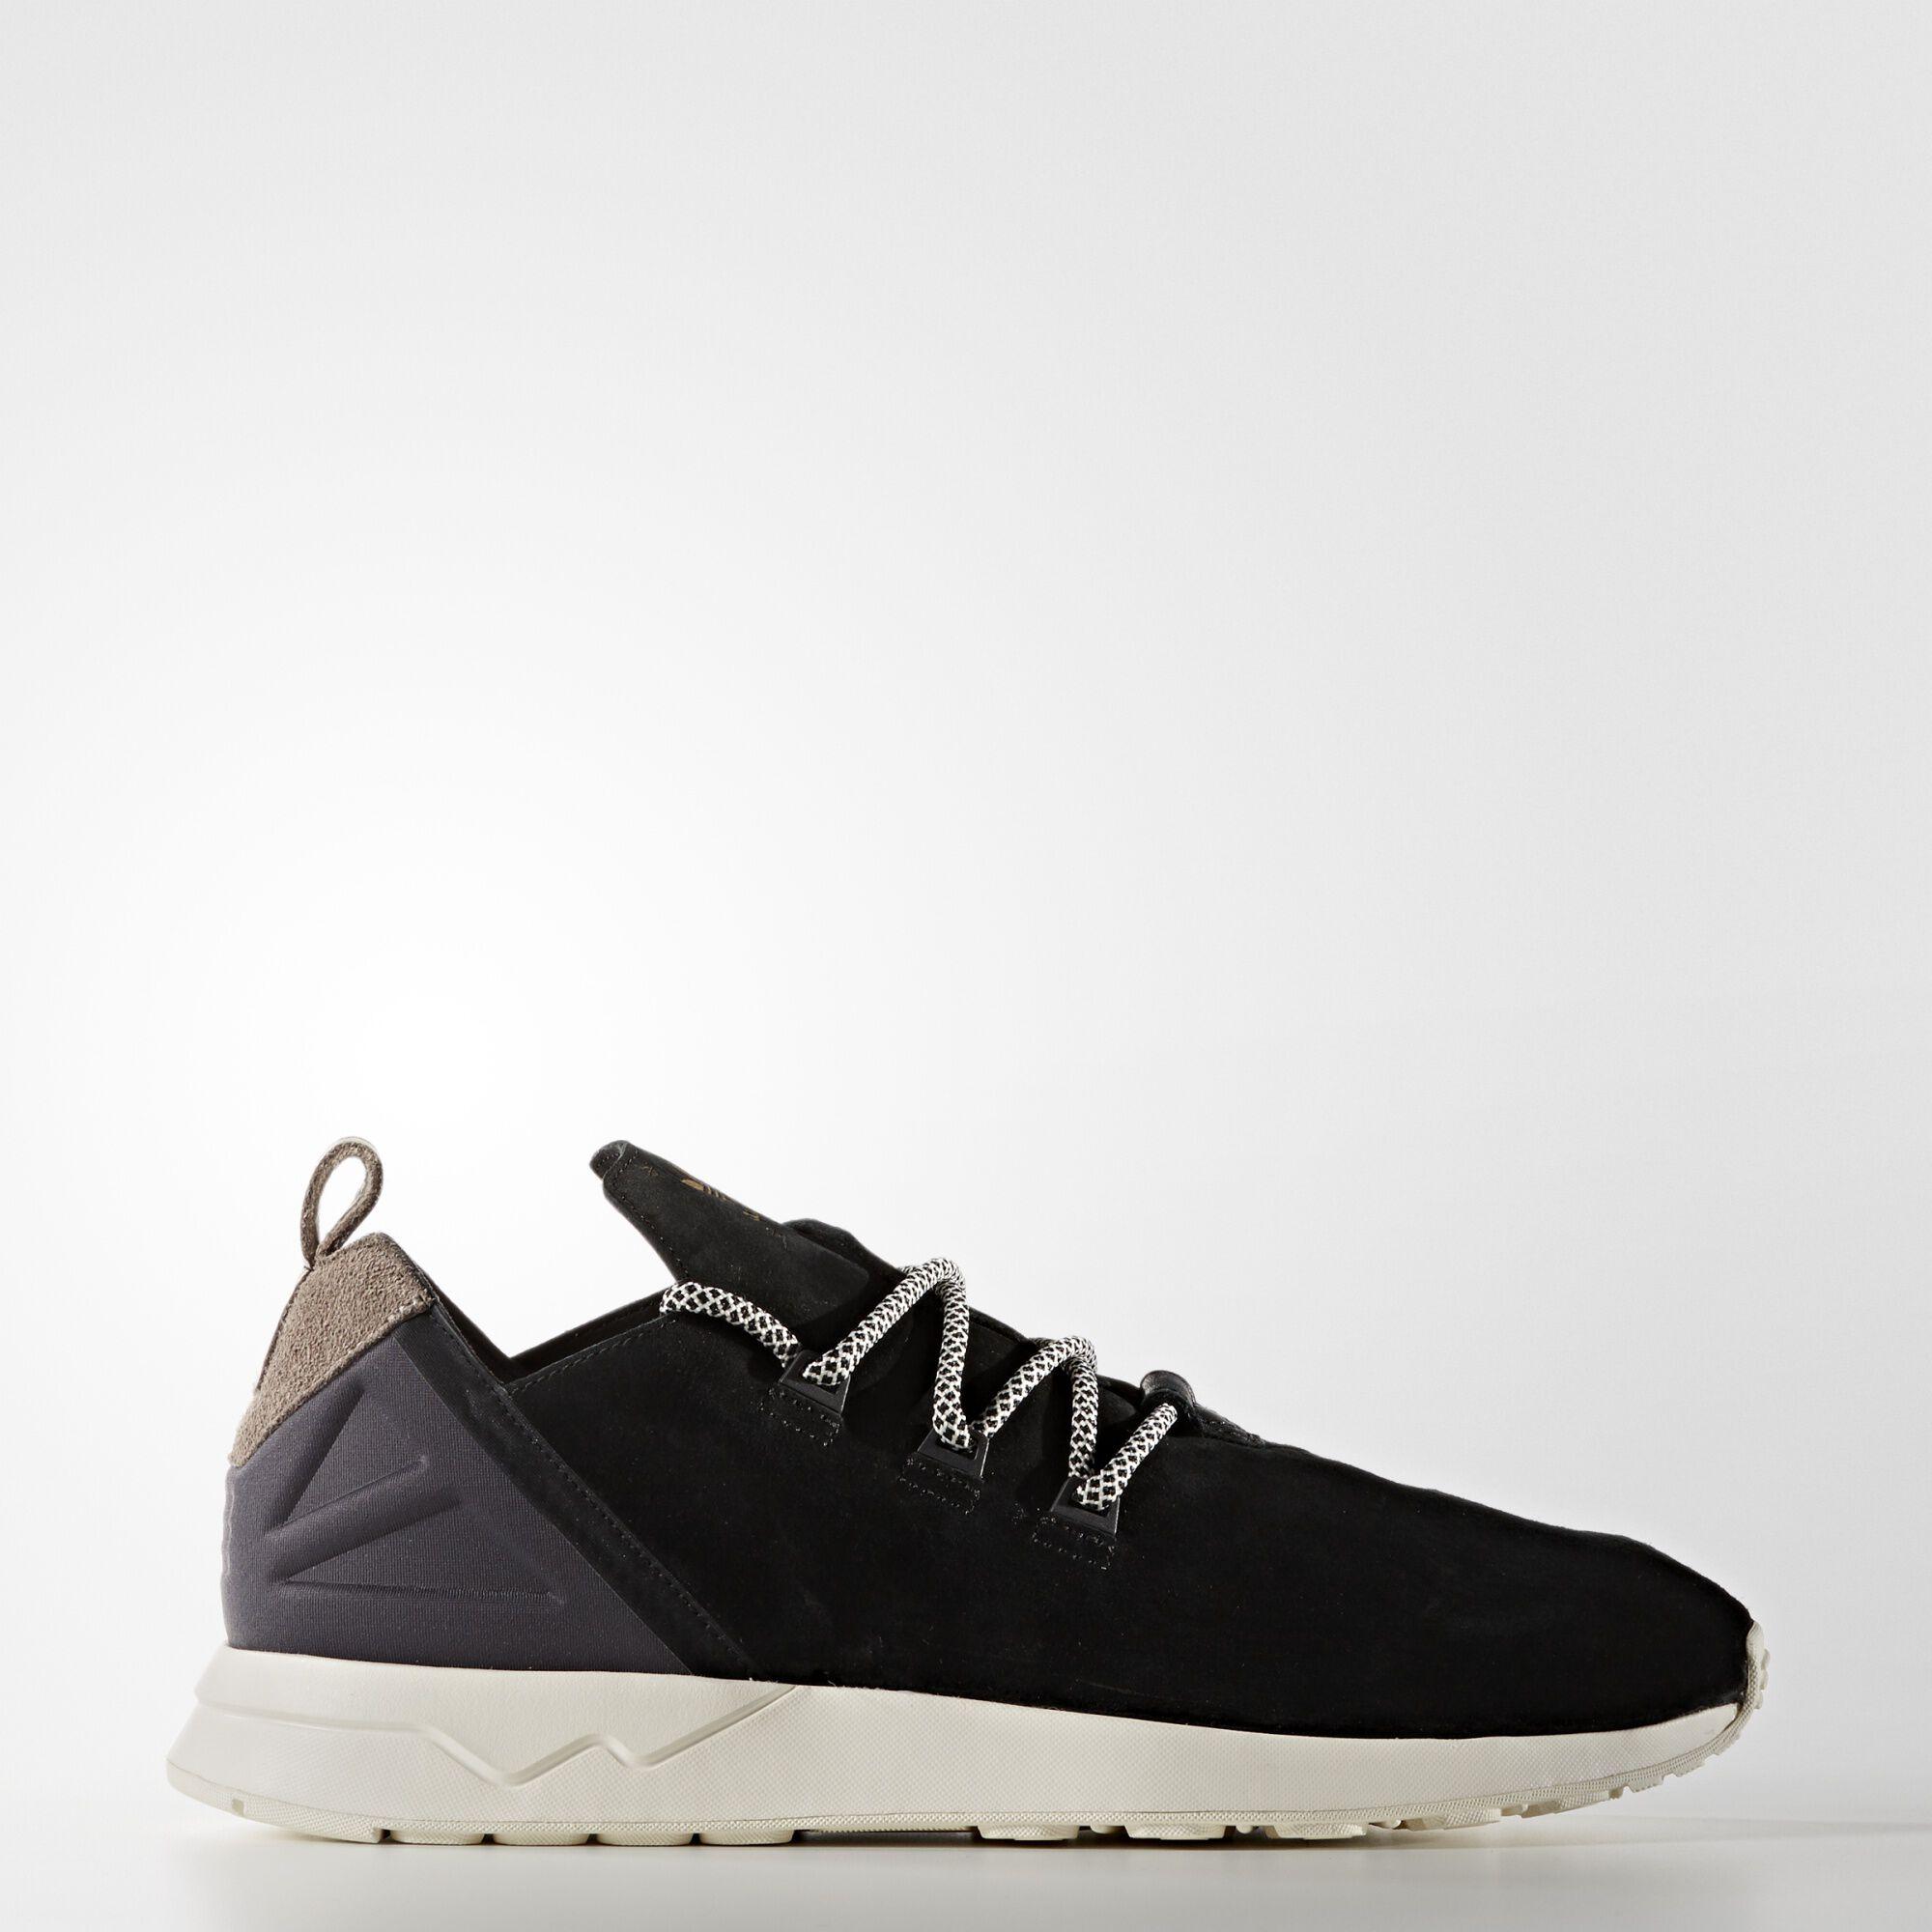 Cheap Adidas Originals ZX Flux Sale